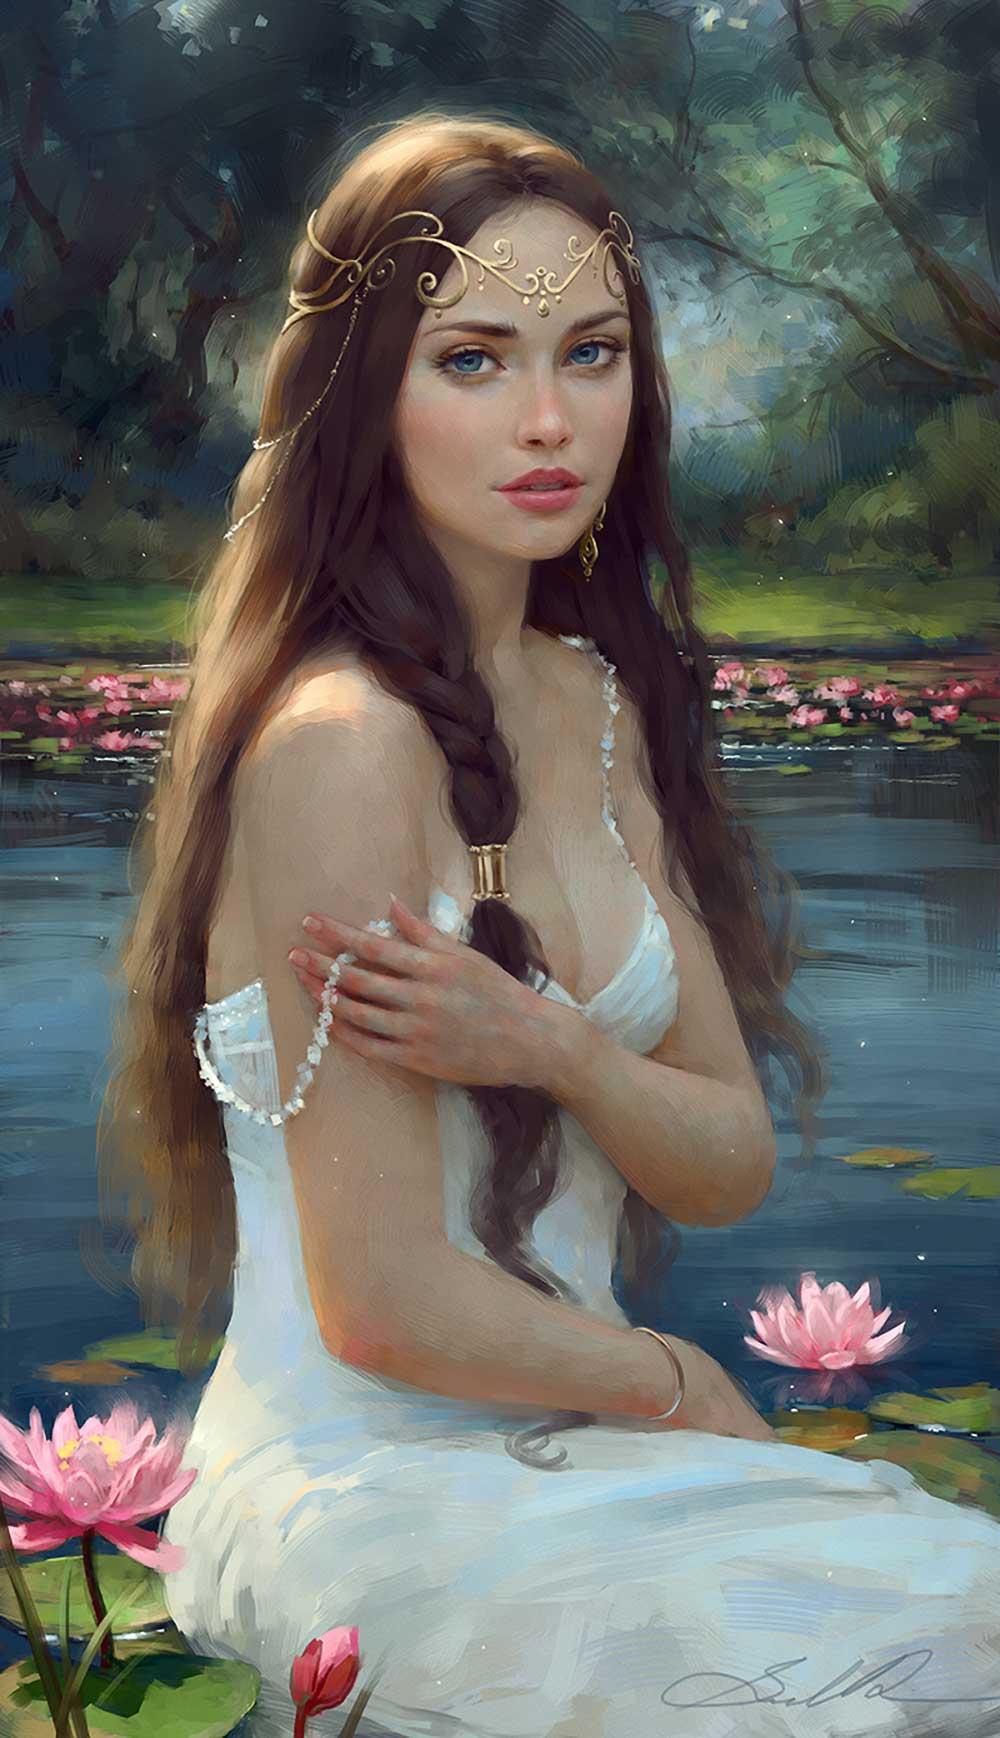 Inspirational Art : Water Lily Dream by Selenada